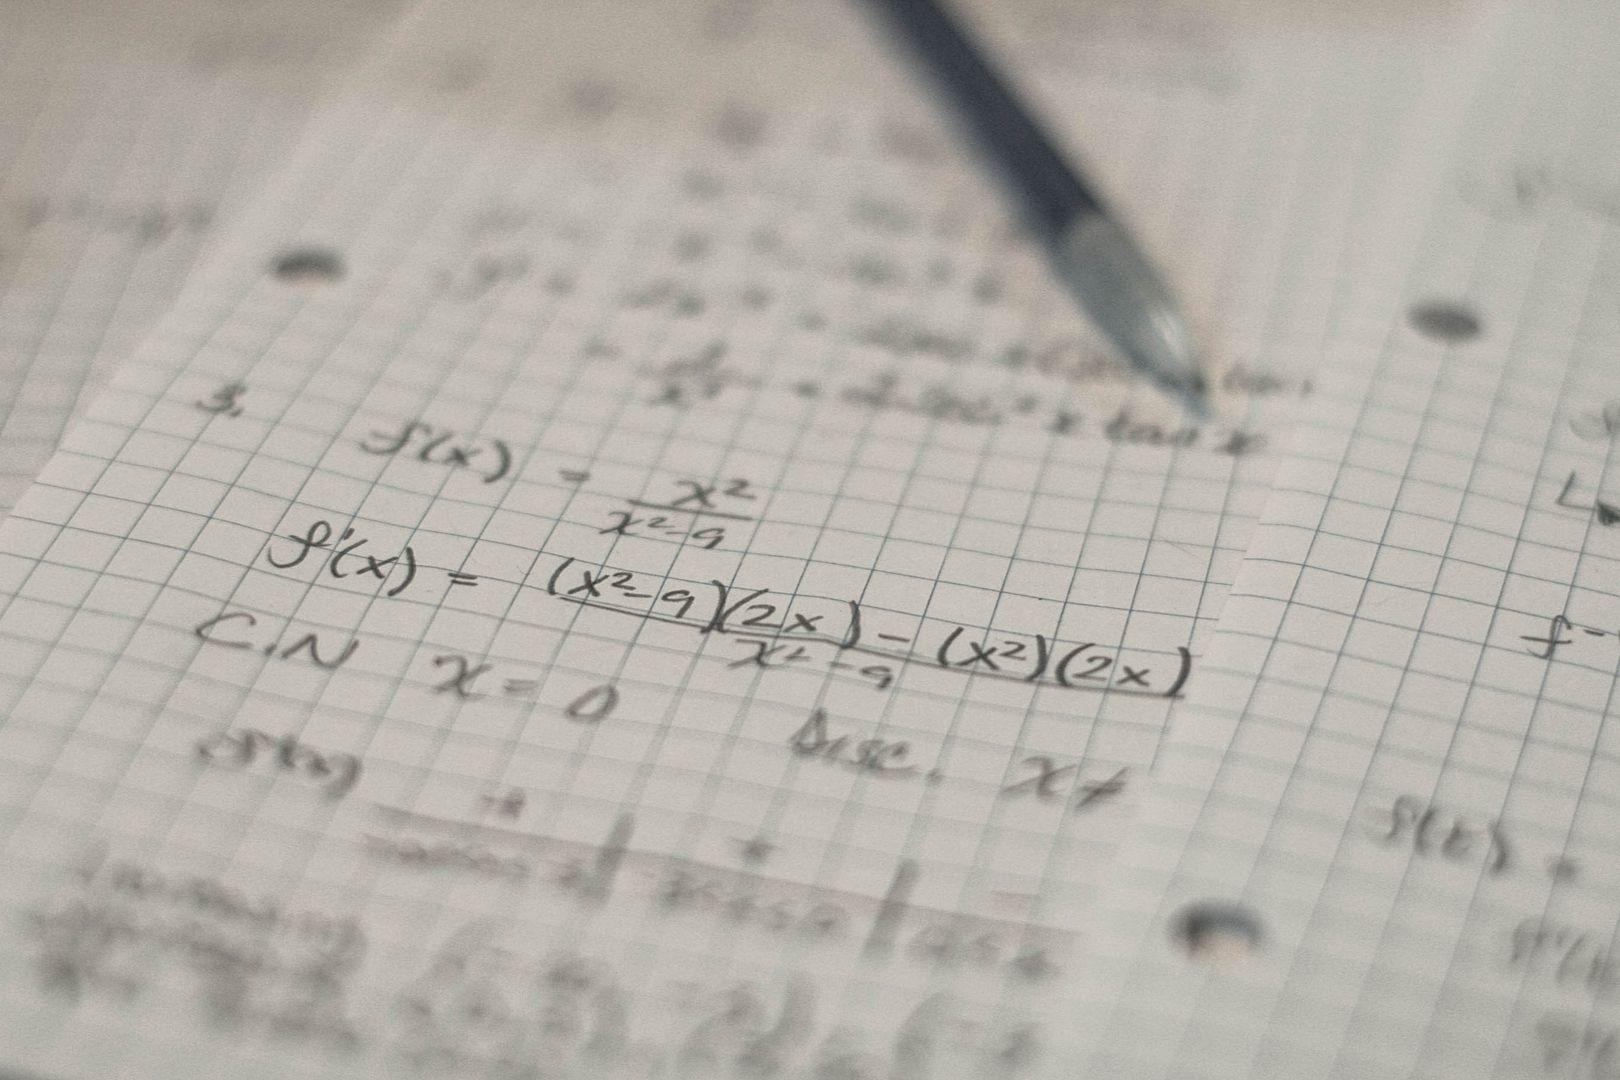 Help solve my math homework